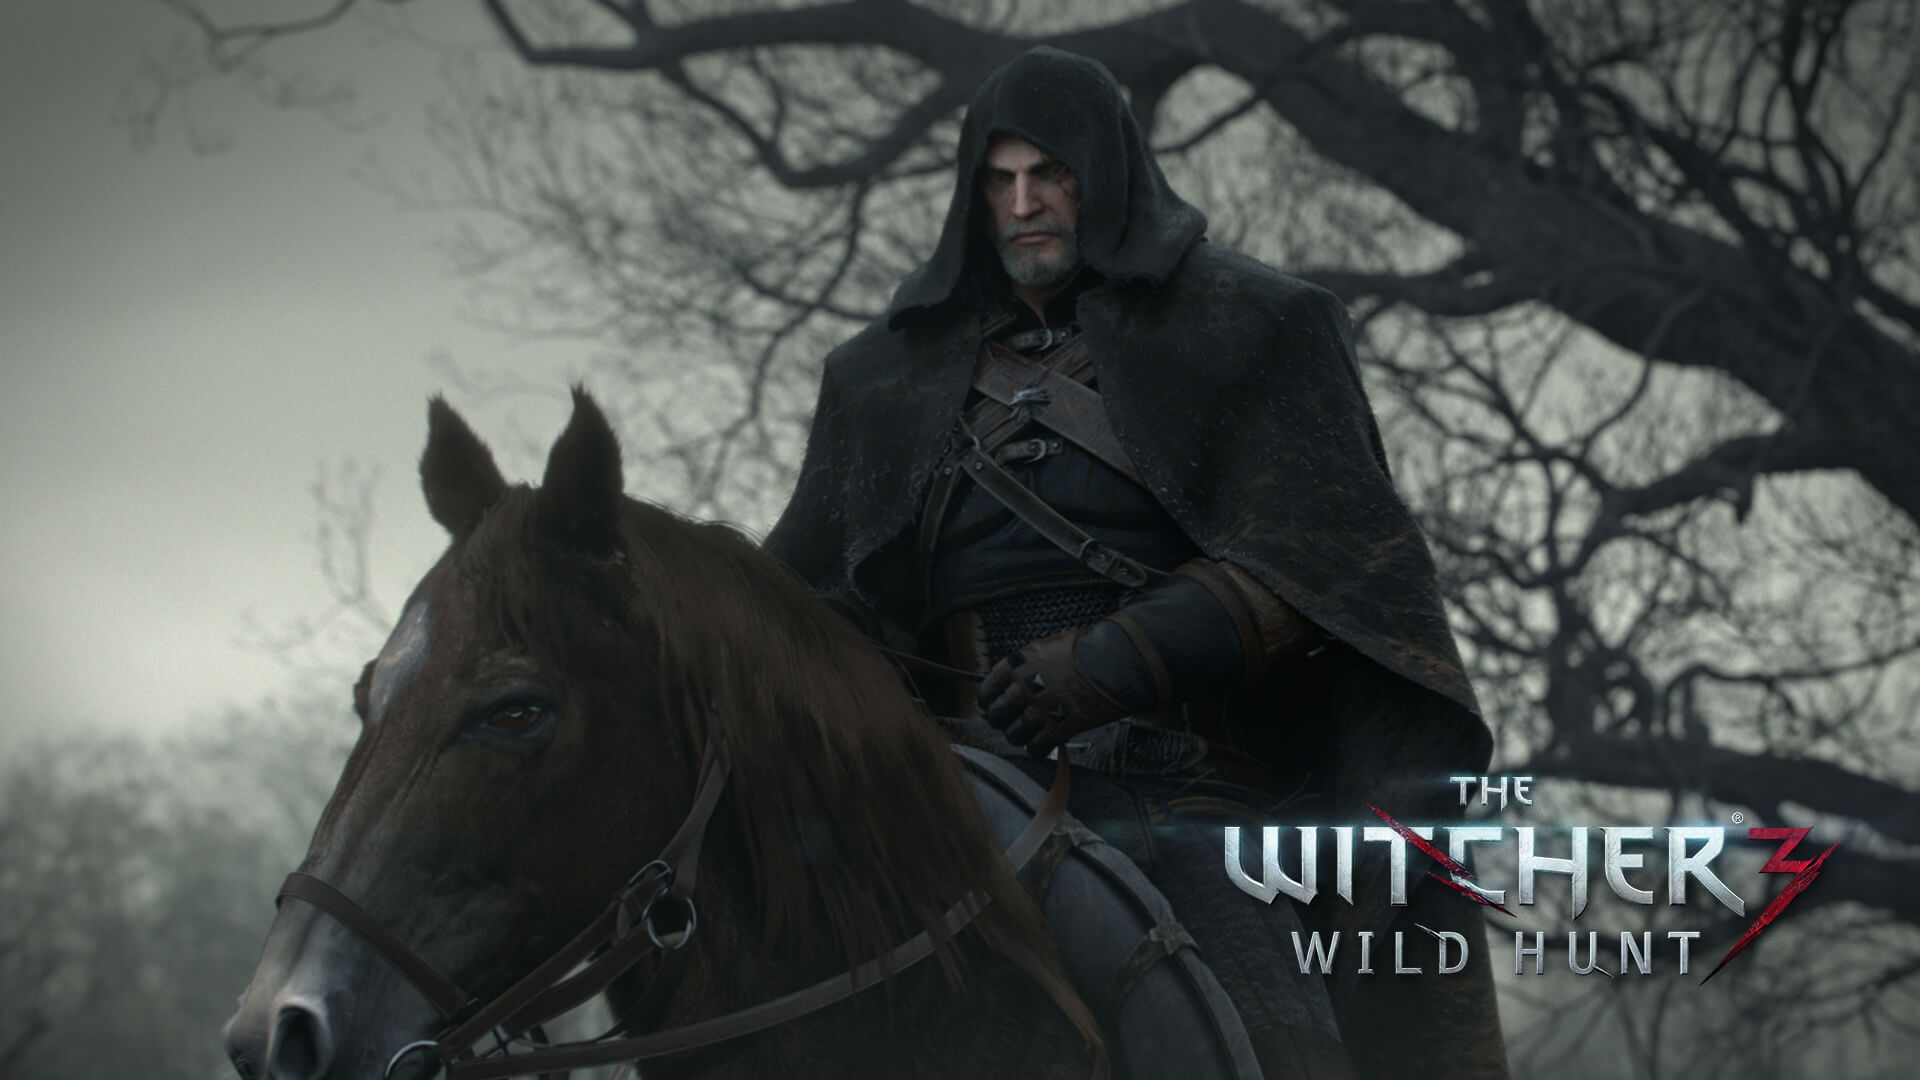 The Witcher 3: Wild Hunt 1080p Geralt Wallpaper